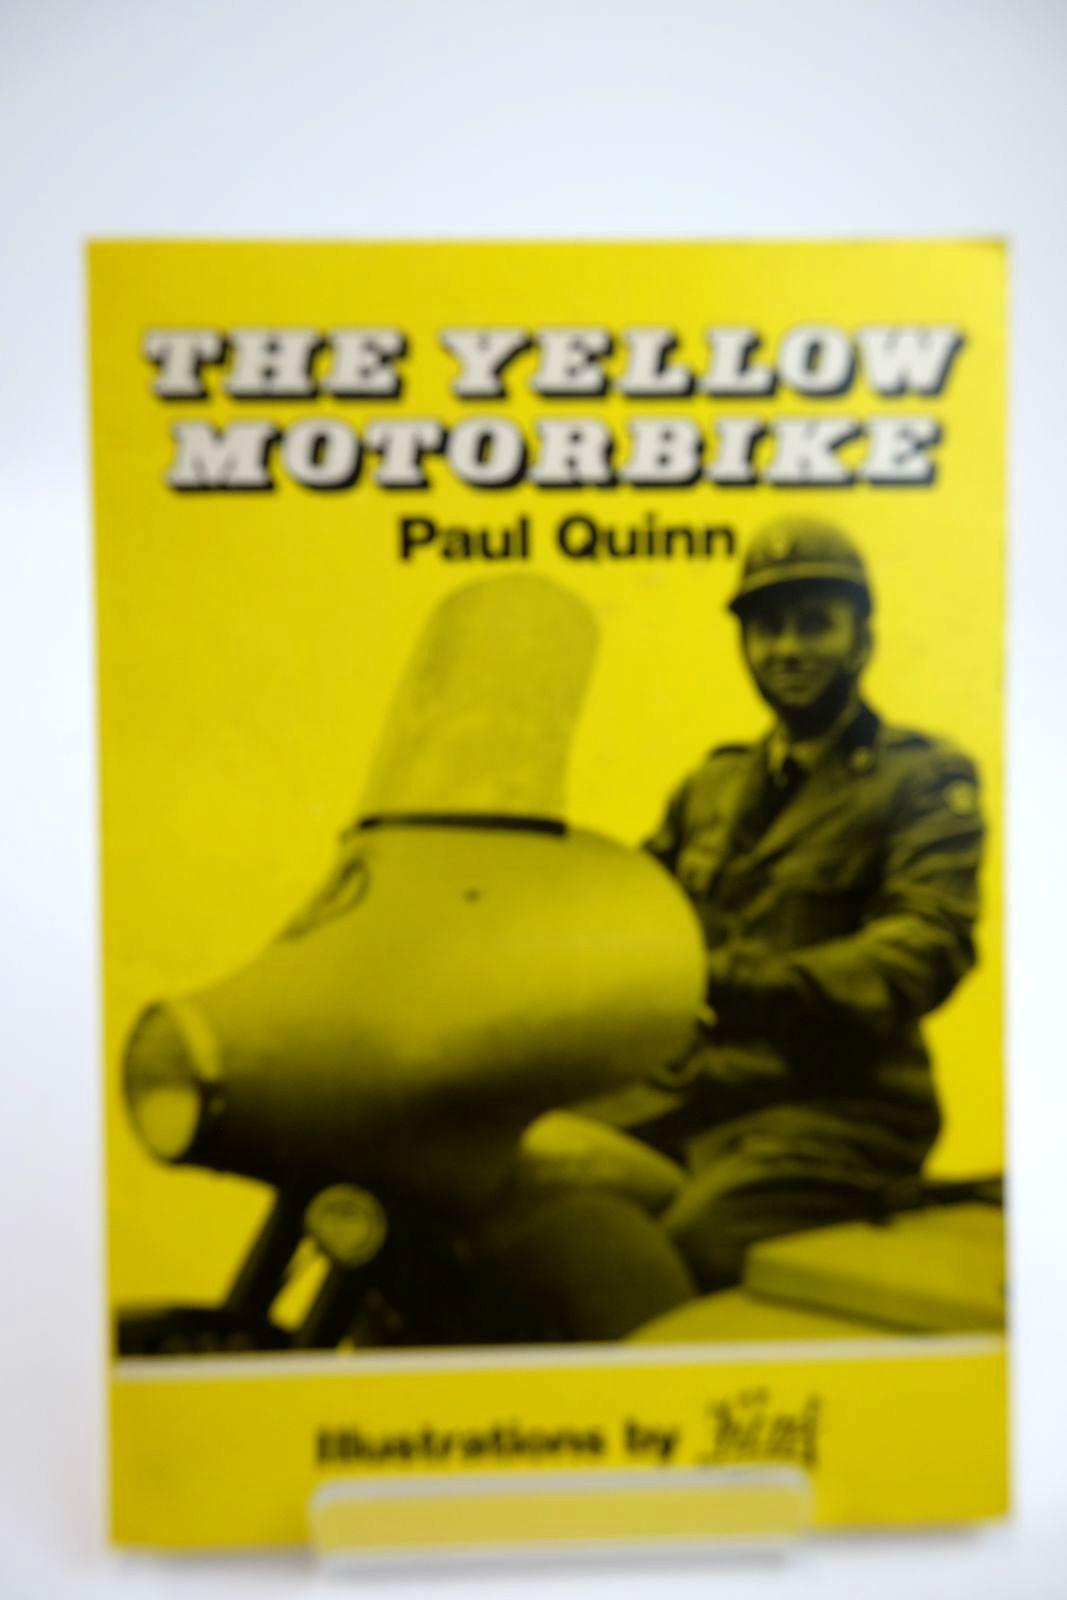 Photo of THE YELLOW MOTORBIKE- Stock Number: 2132358